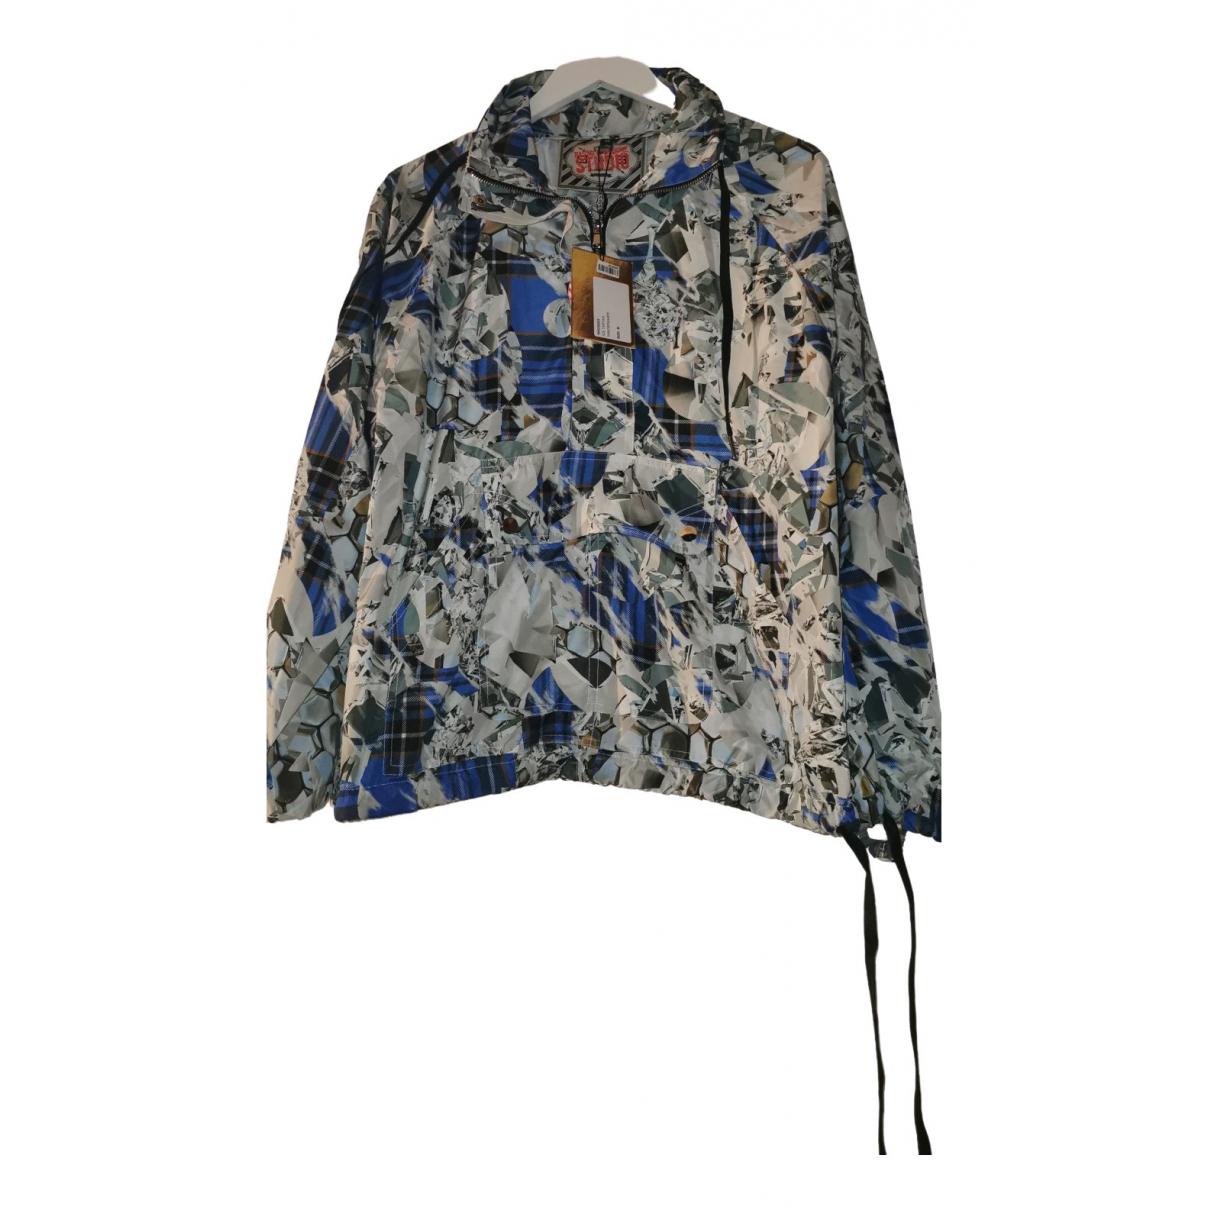 Basso & Brooke \N Multicolour coat for Women M International